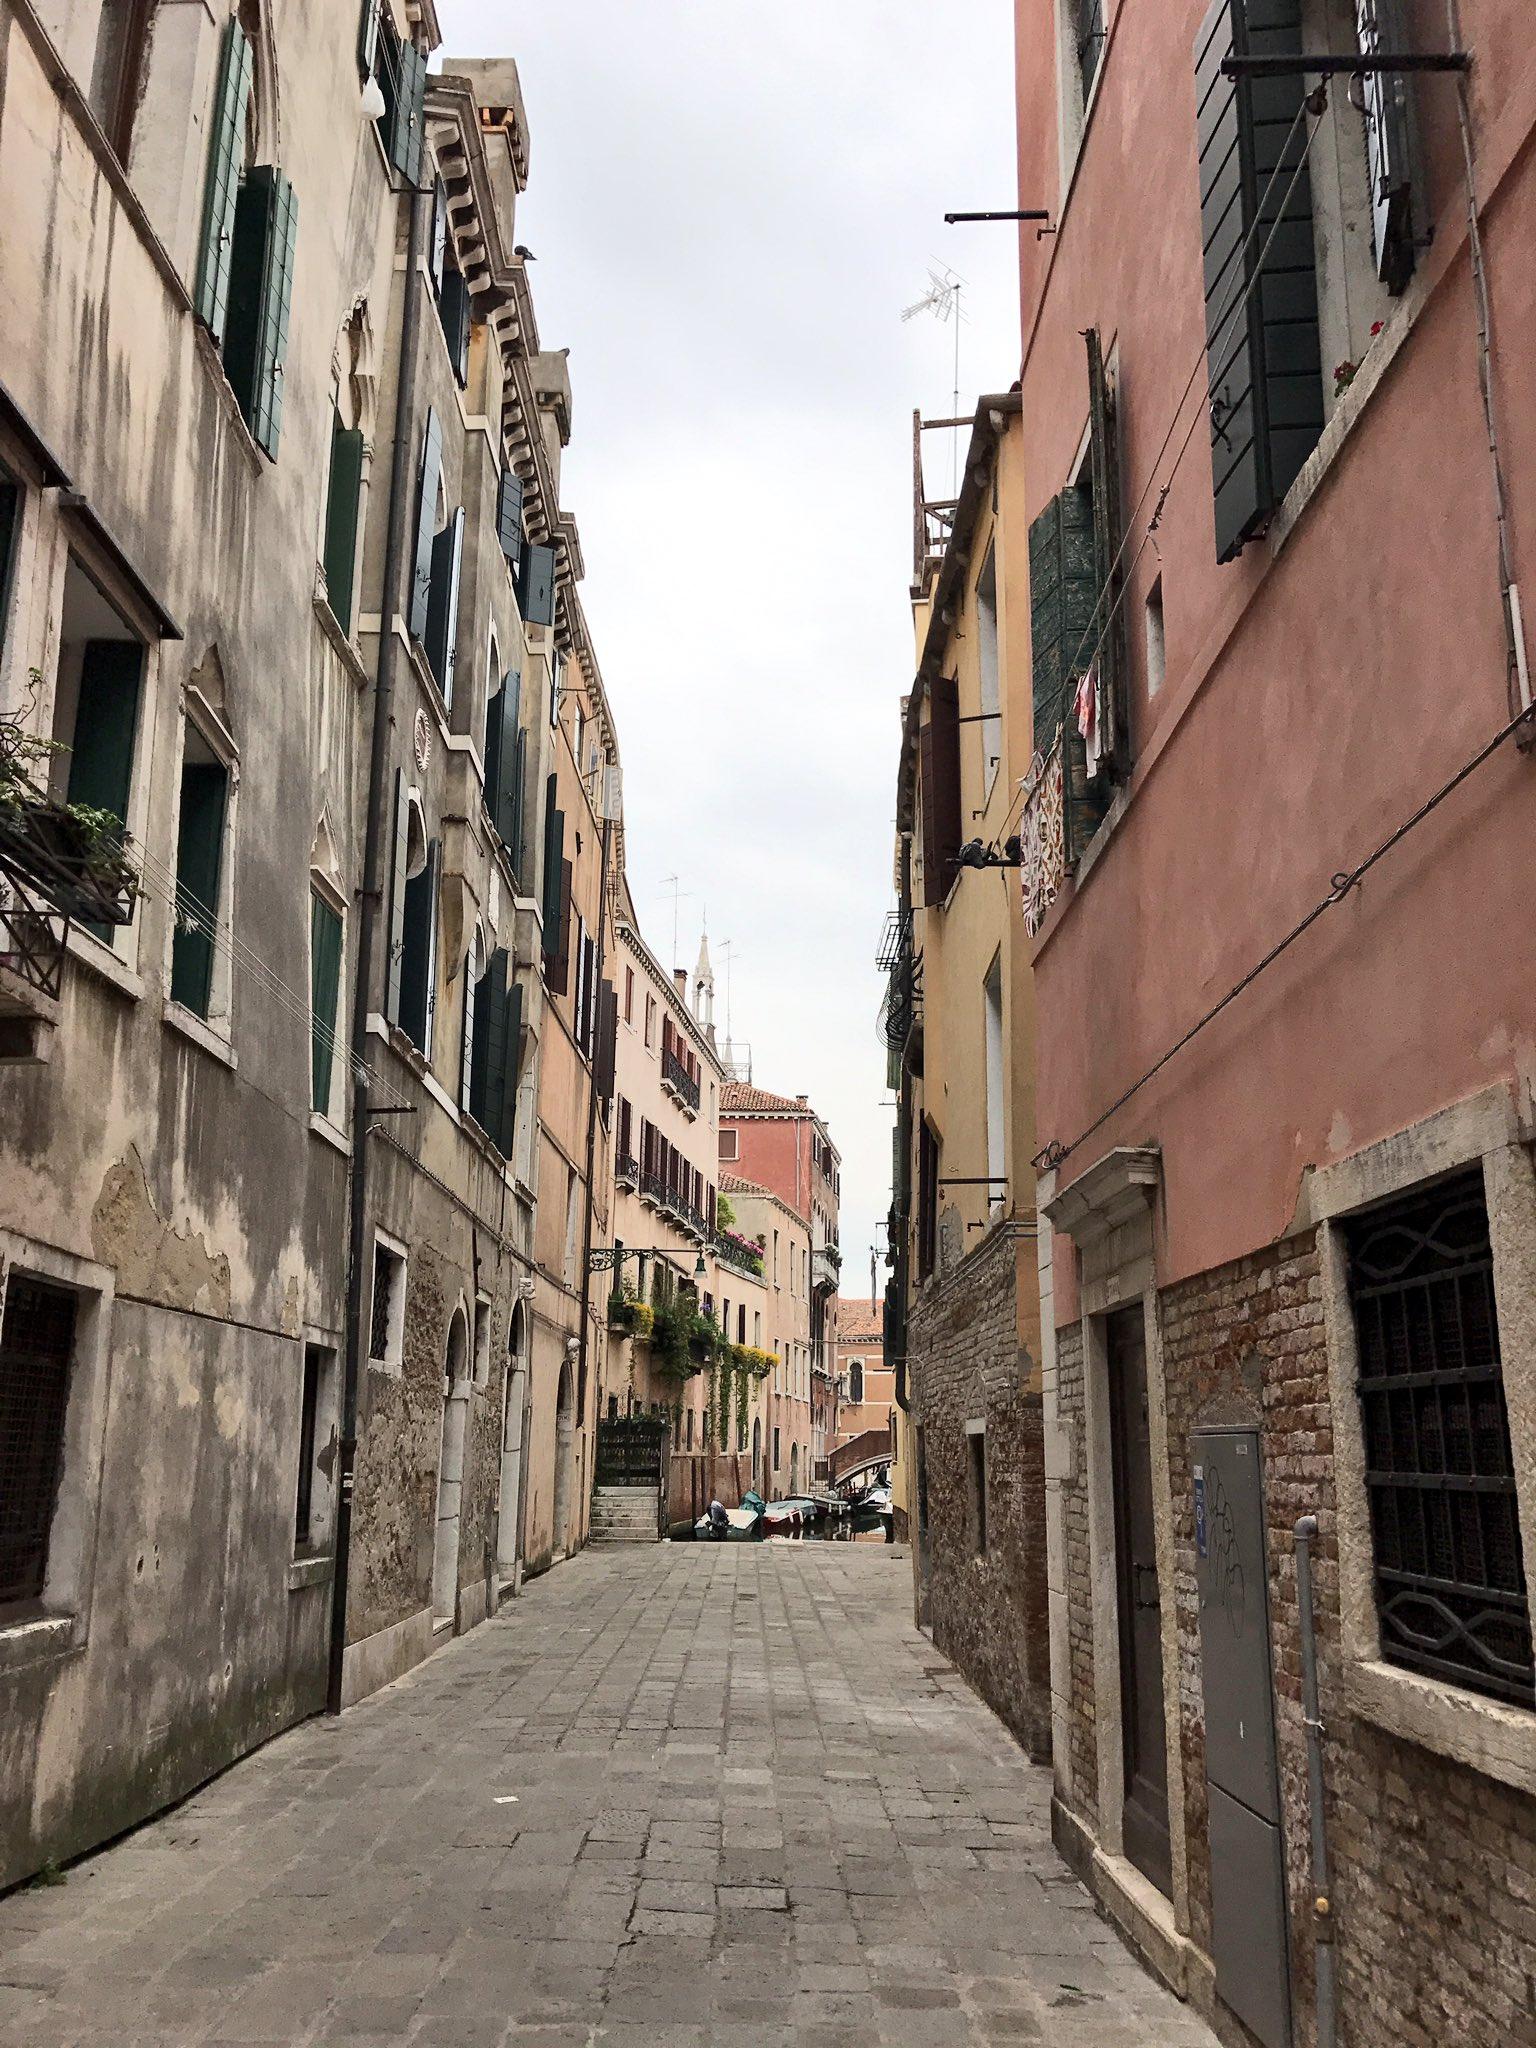 Venice is beaut. https://t.co/UKC3nTqziK